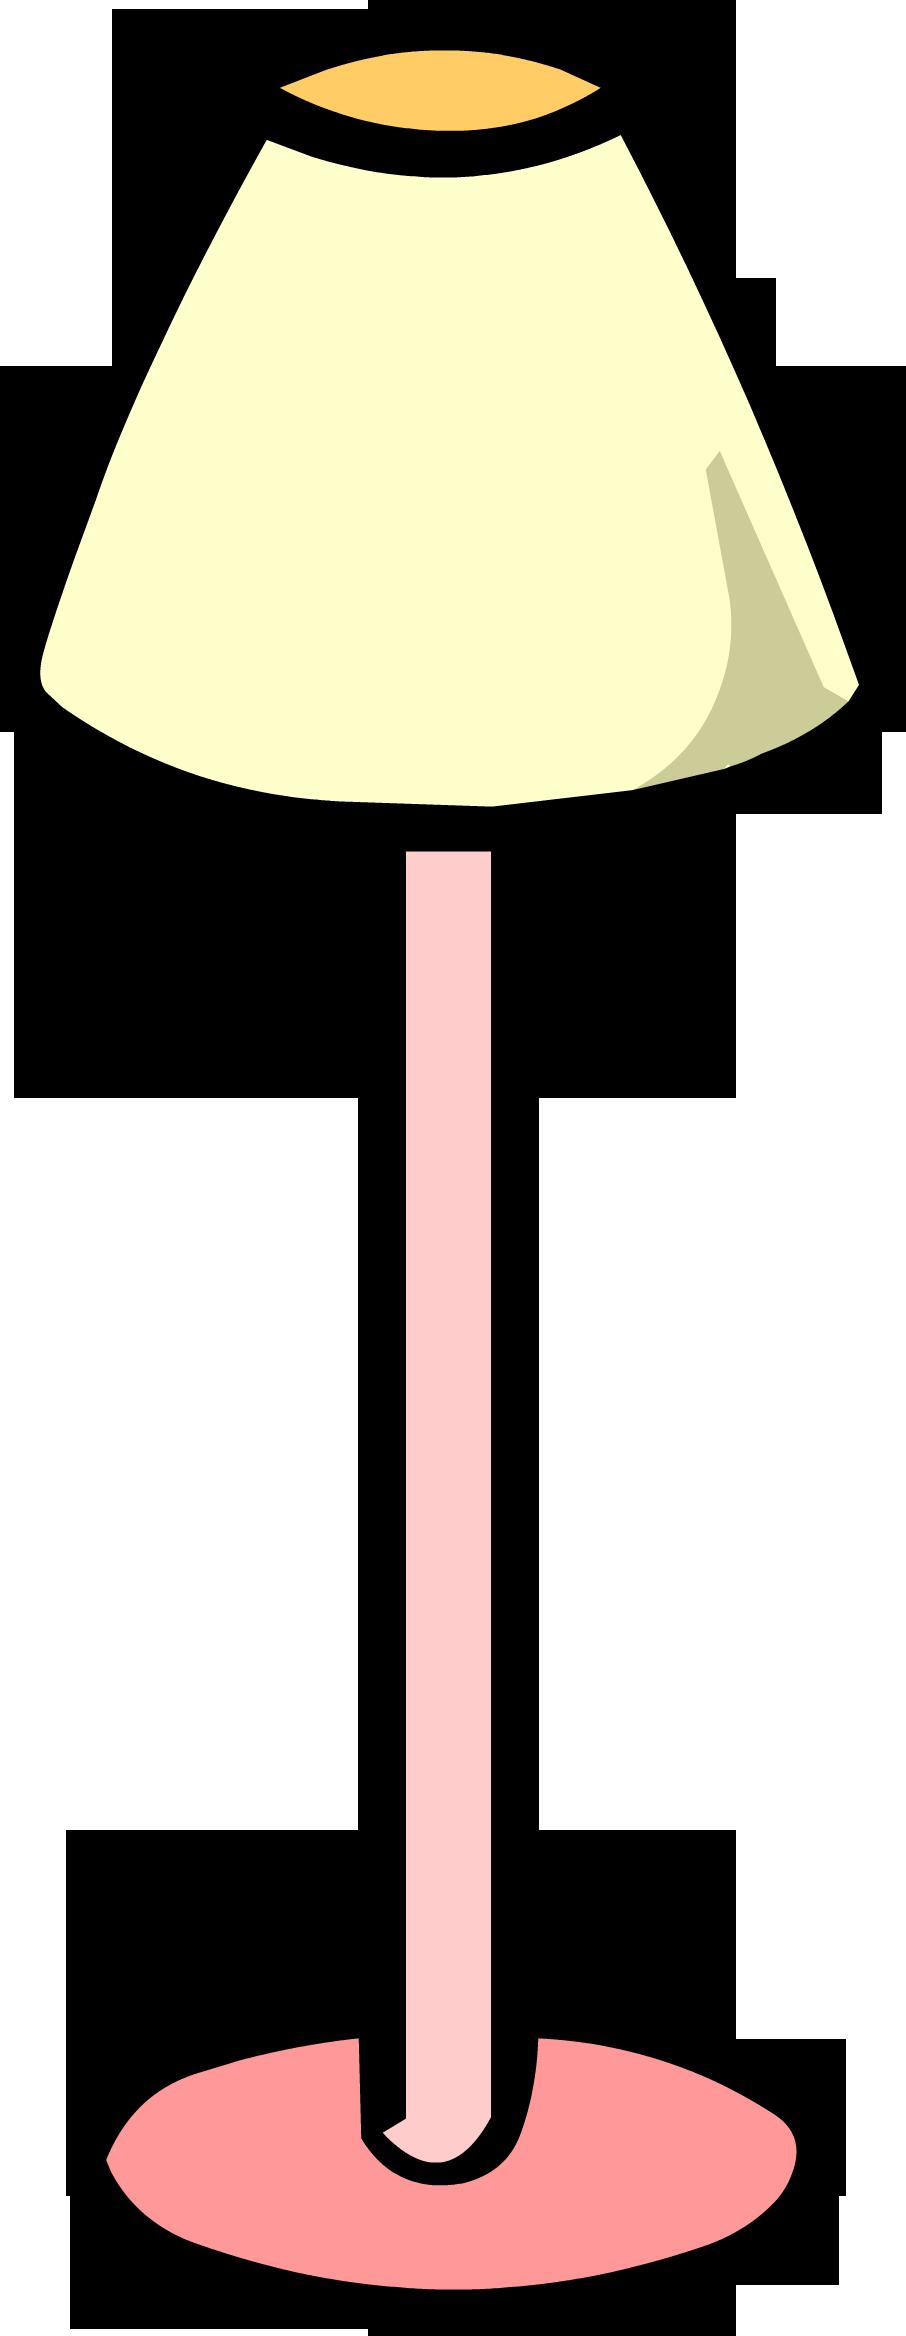 Lamp clipart pink lamp. Club penguin wiki fandom